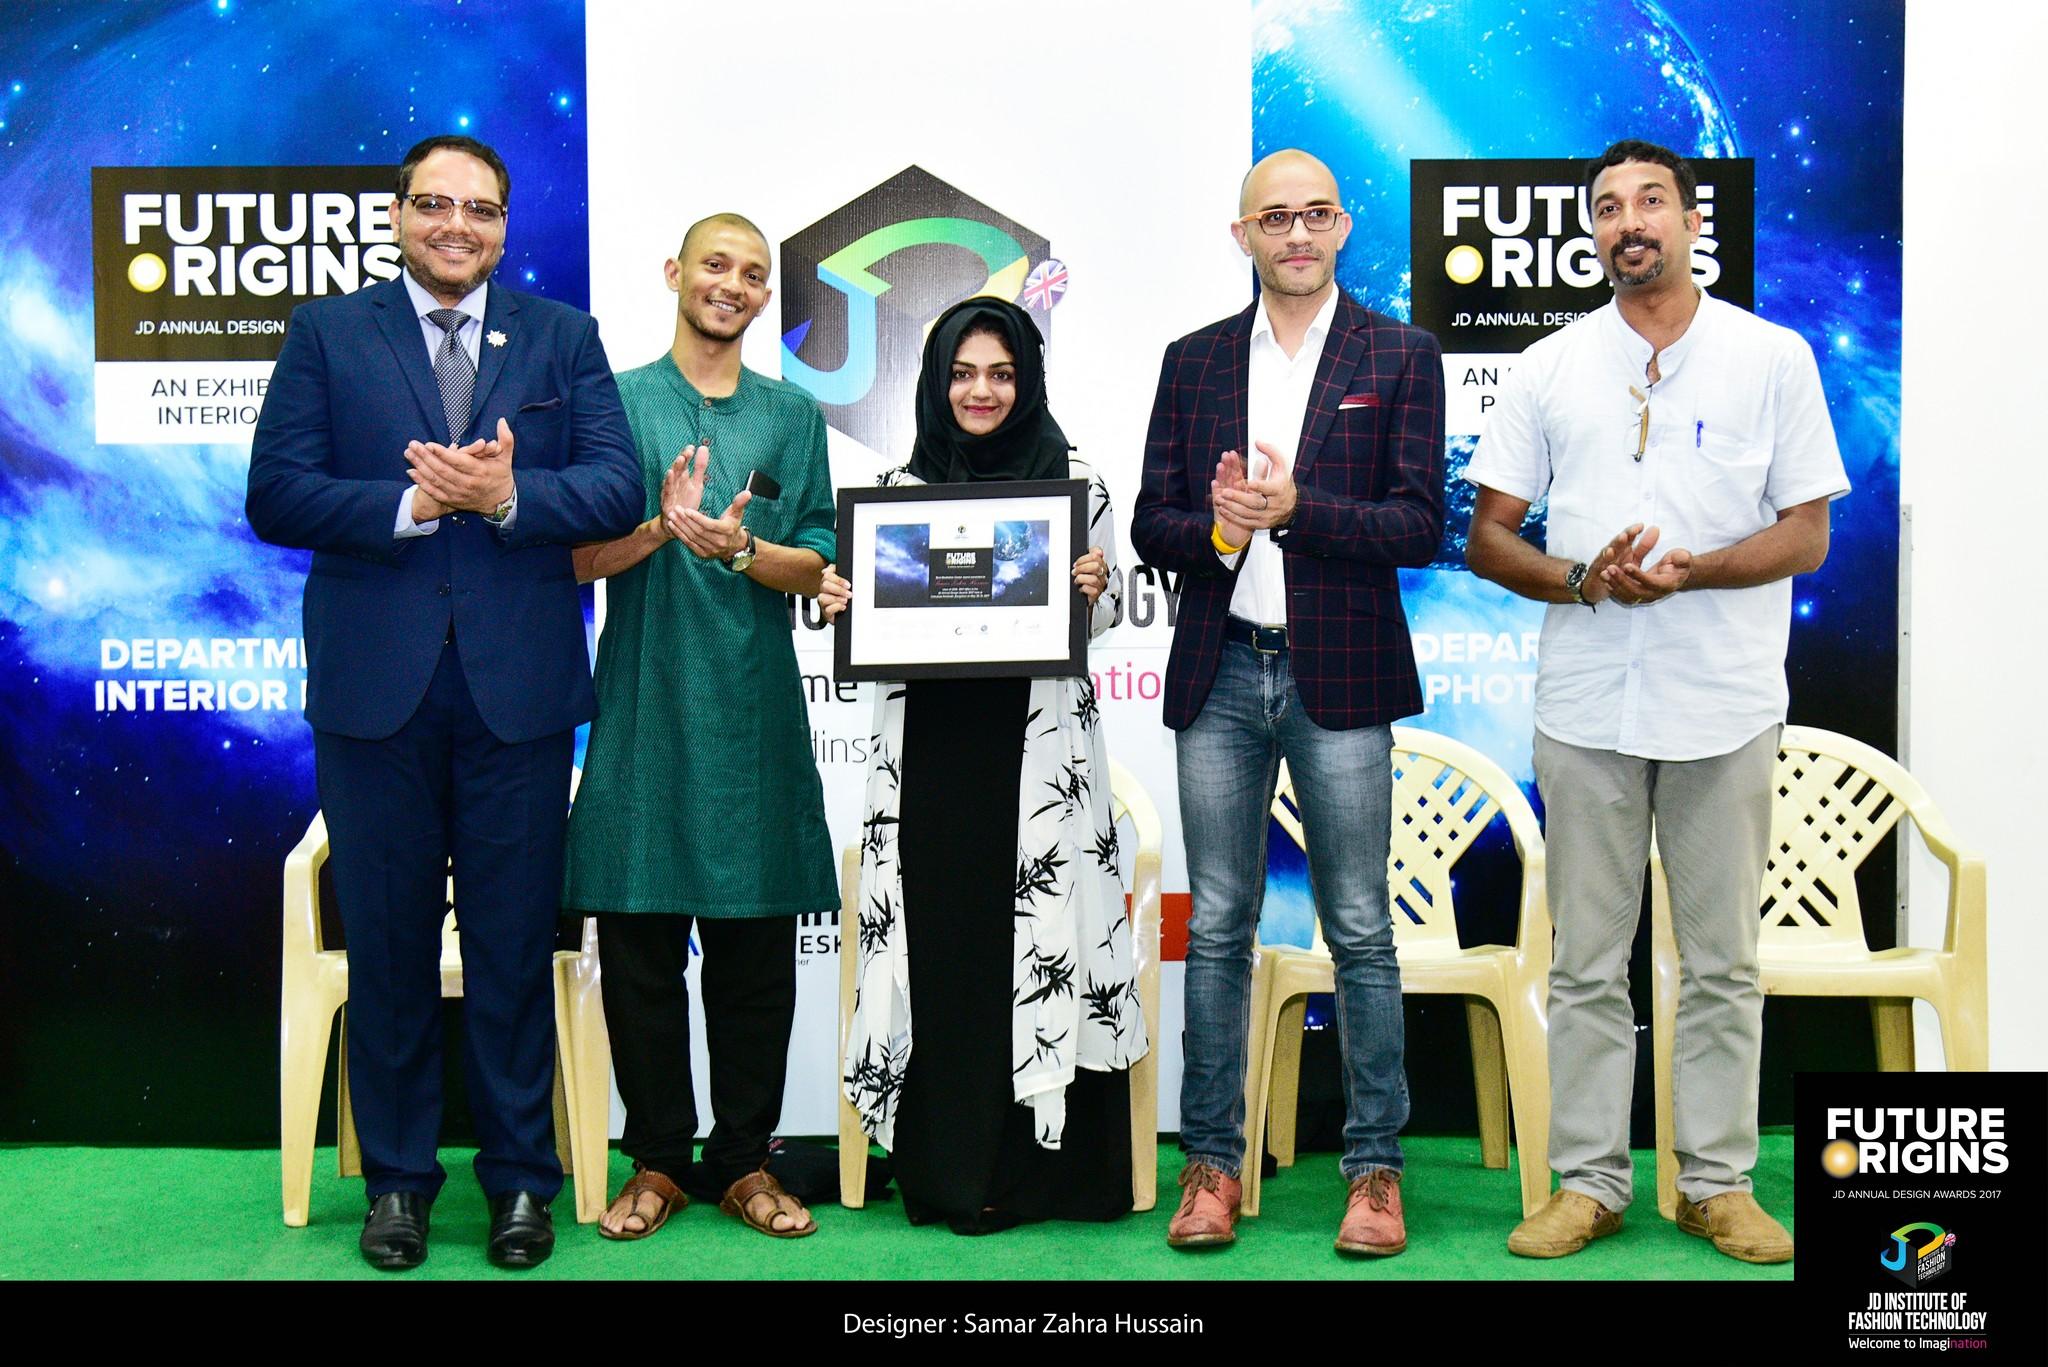 Cosmid – Future Origin – JD Annual Design Awards 2017 - Interior Design   Photography : Jerin Nath (@jerin_nath) cosmid Cosmid – Future Origin – JD Annual Design Awards 2017 Cosmid     Future Origin     JD Annual Design Awards 2017 2